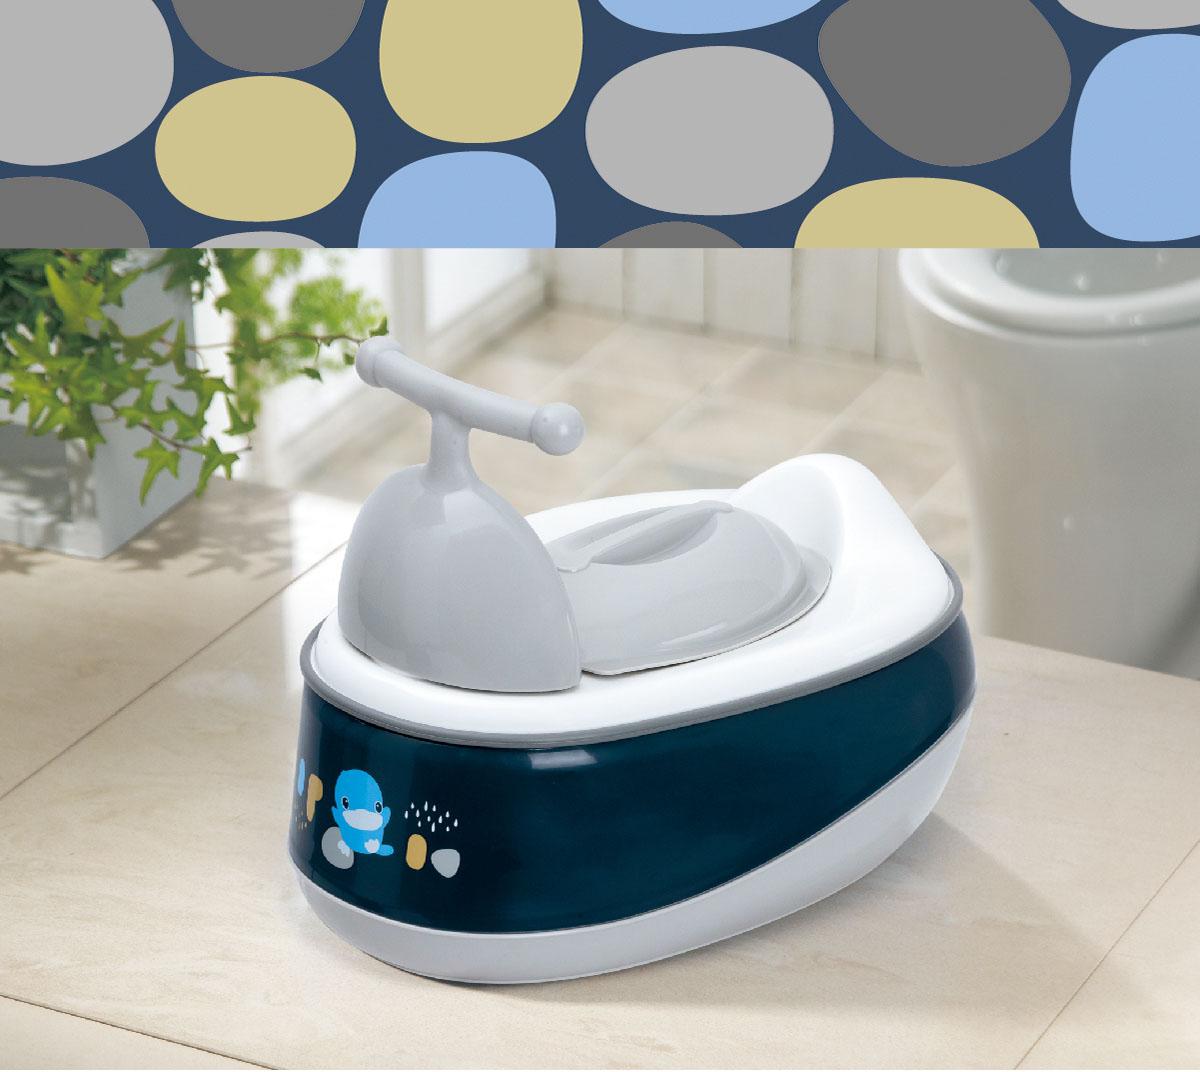 proimages/Bathing&CleanSeries/potty/1136/1136-EDM-12.jpg